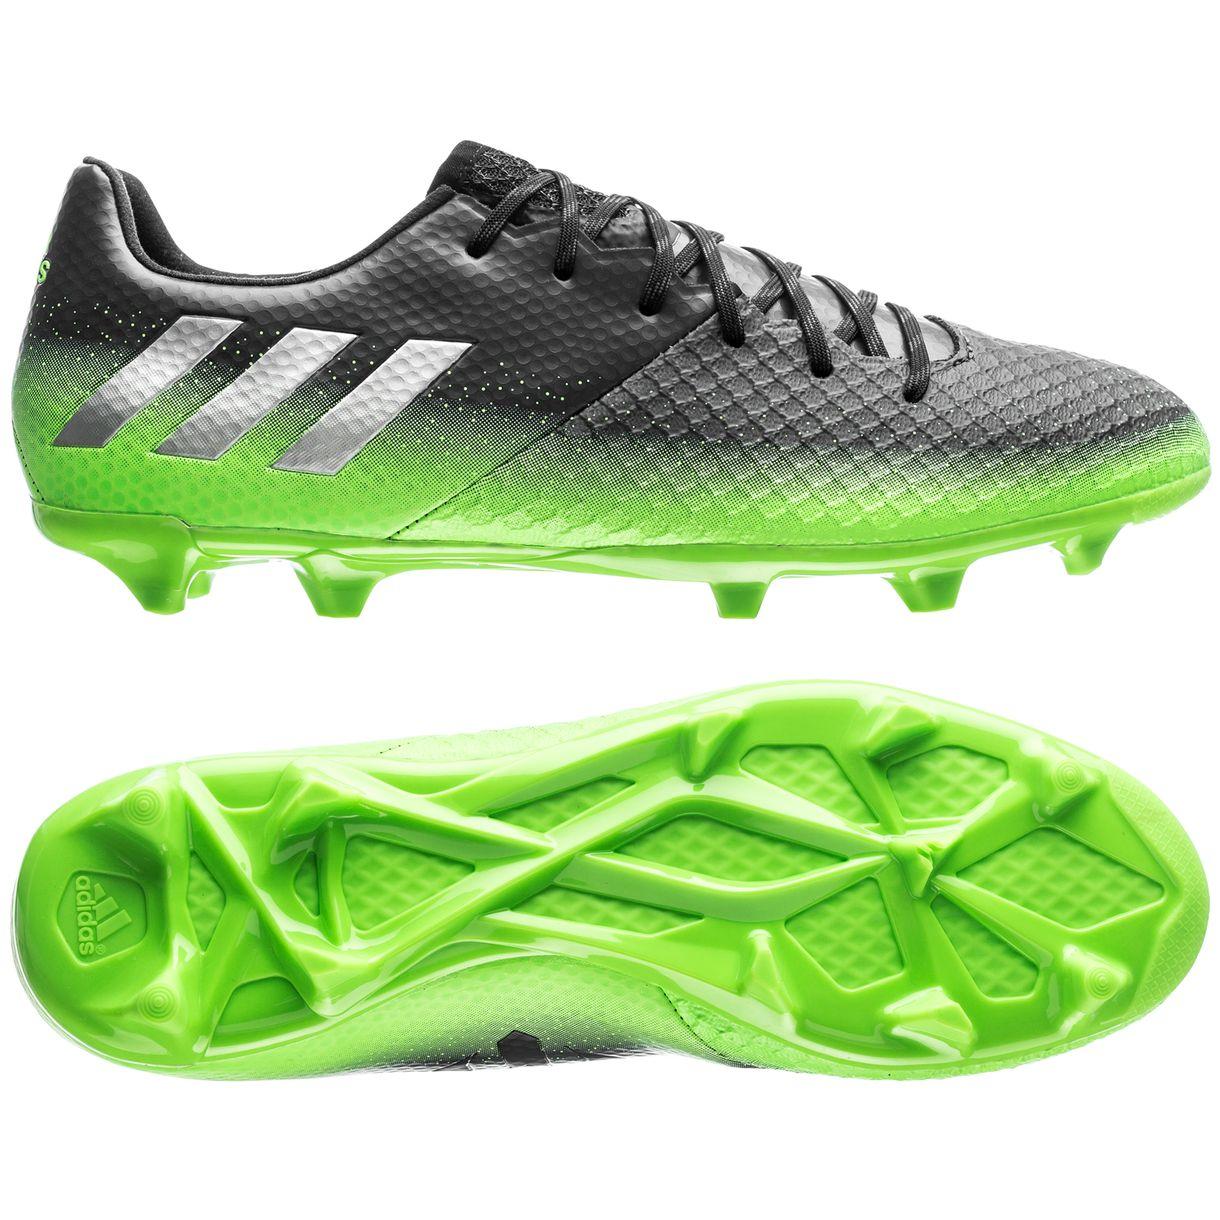 a5676468dd2 Adidas Voetbalschoenen - Messi 16.2 FG